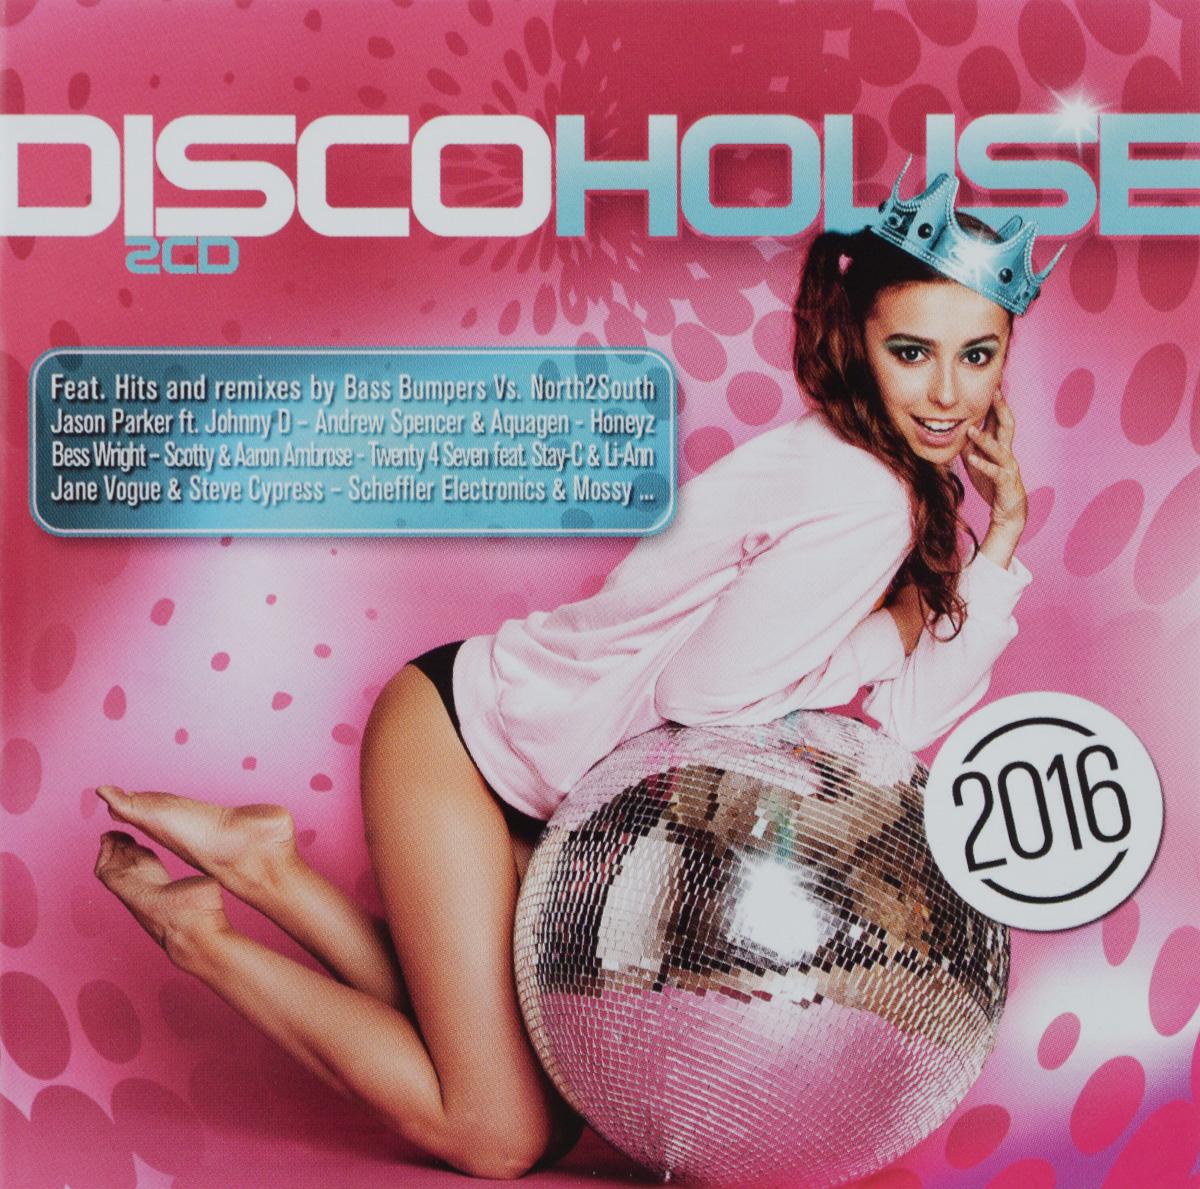 Disco House 2016 (2 CD) disco house 2016 2 cd